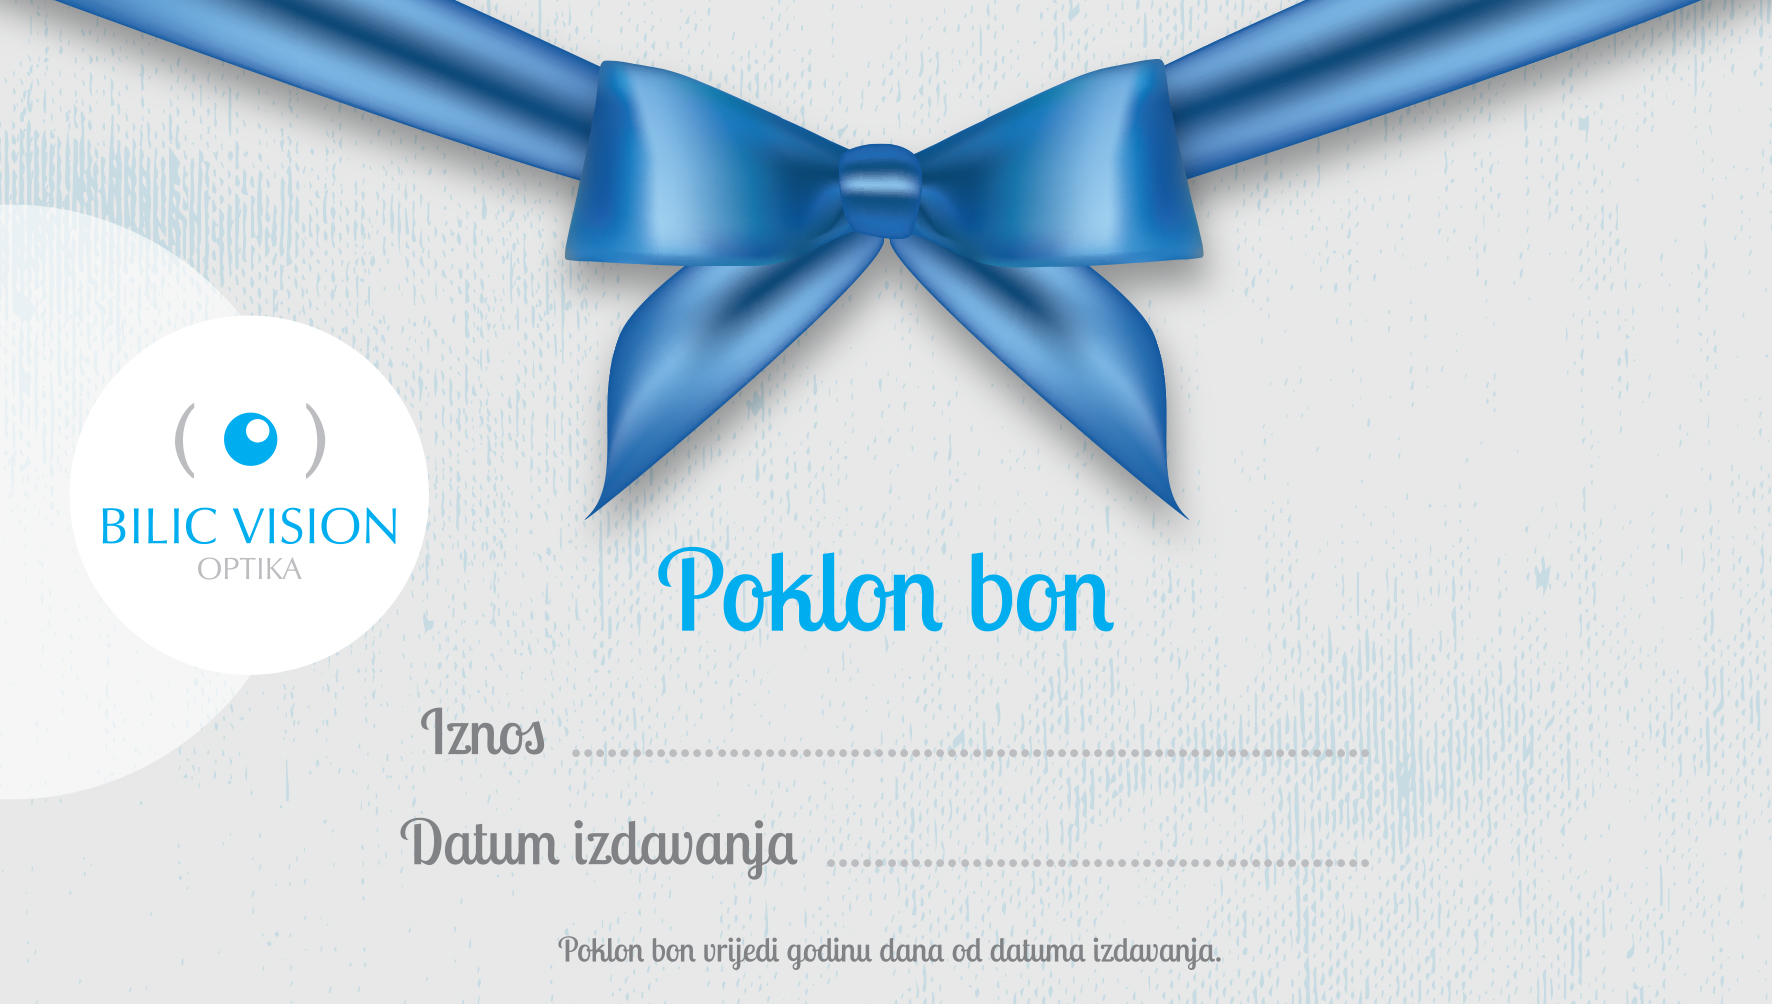 poklon bon_15x8,5_krivulje_print